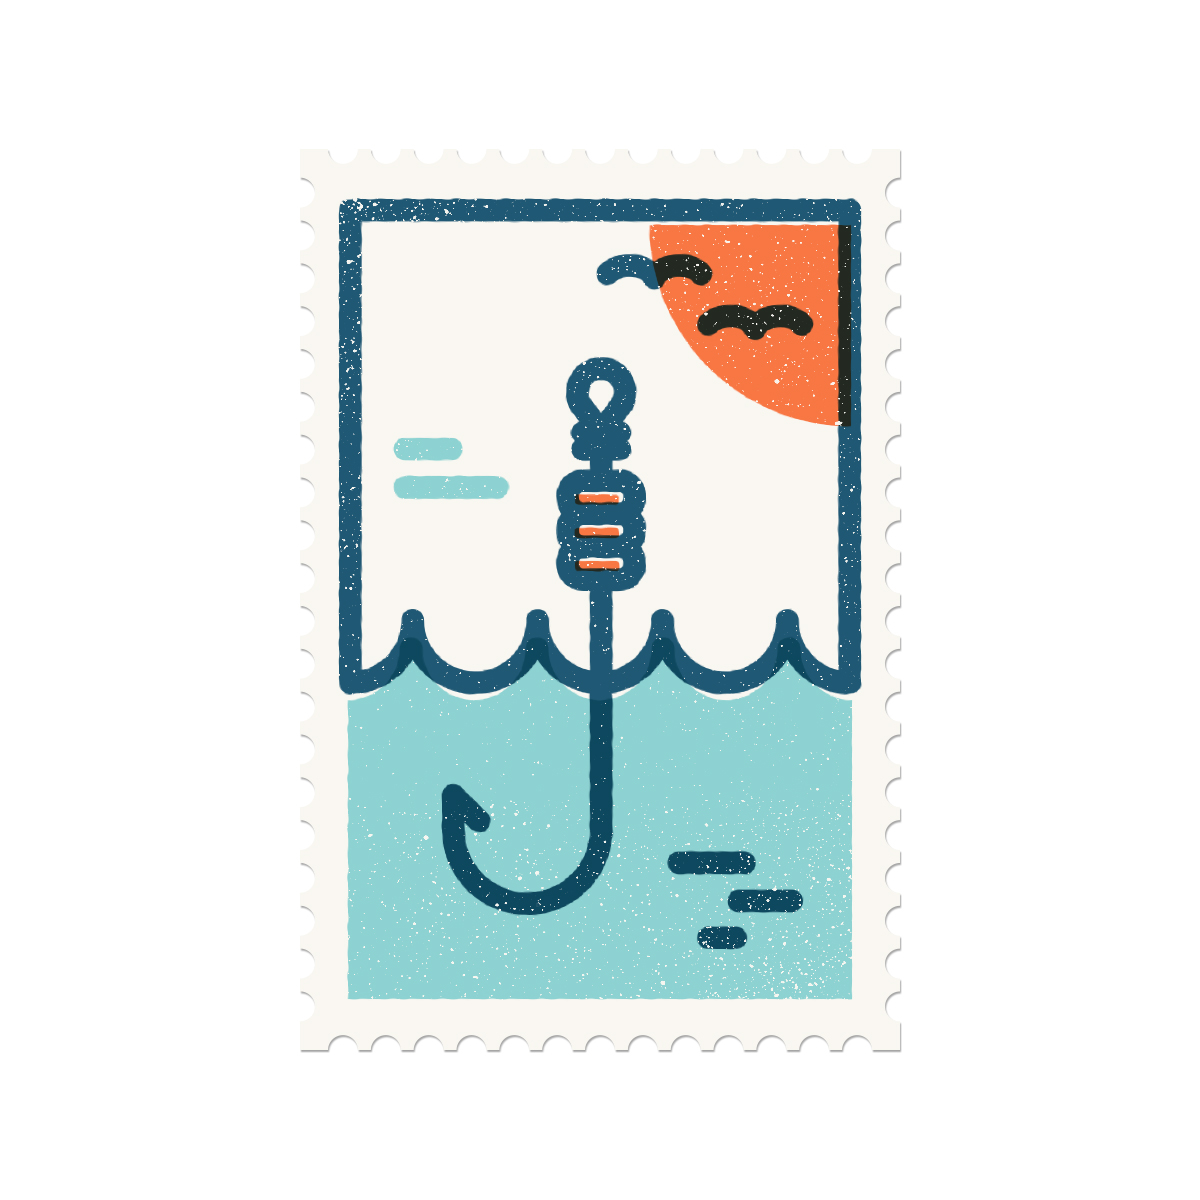 Illustration of a stamp with a hook symbolizing the letter J